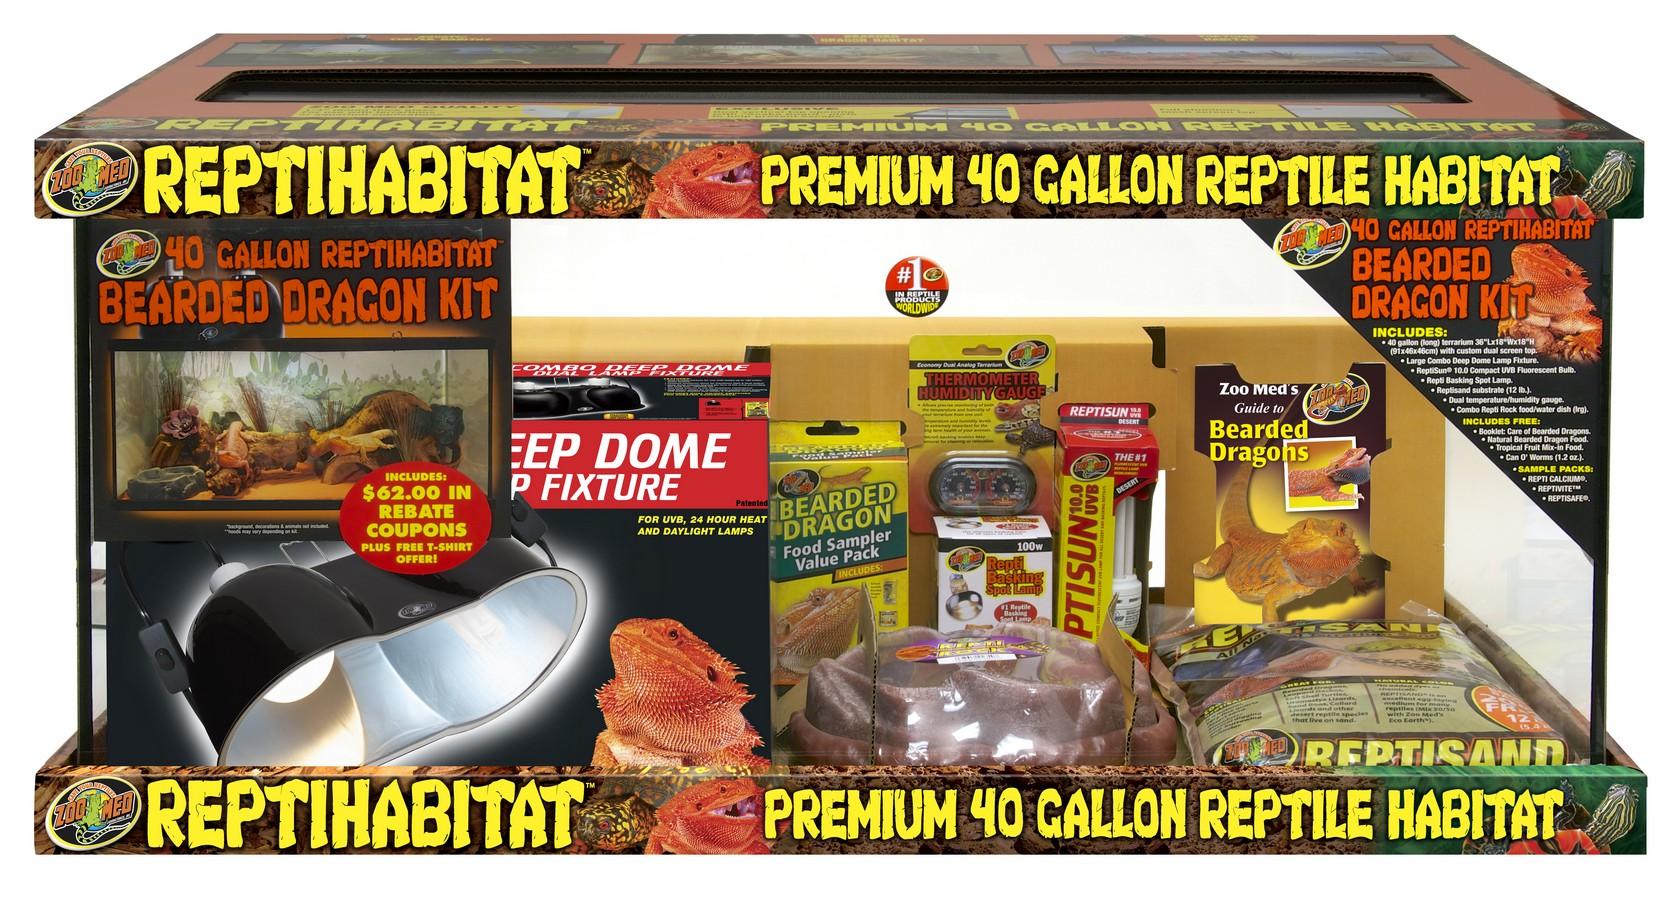 Zoo Med Reptihabitat Premium Reptile Habitat Bearded Dragon Kit, 40-gallon